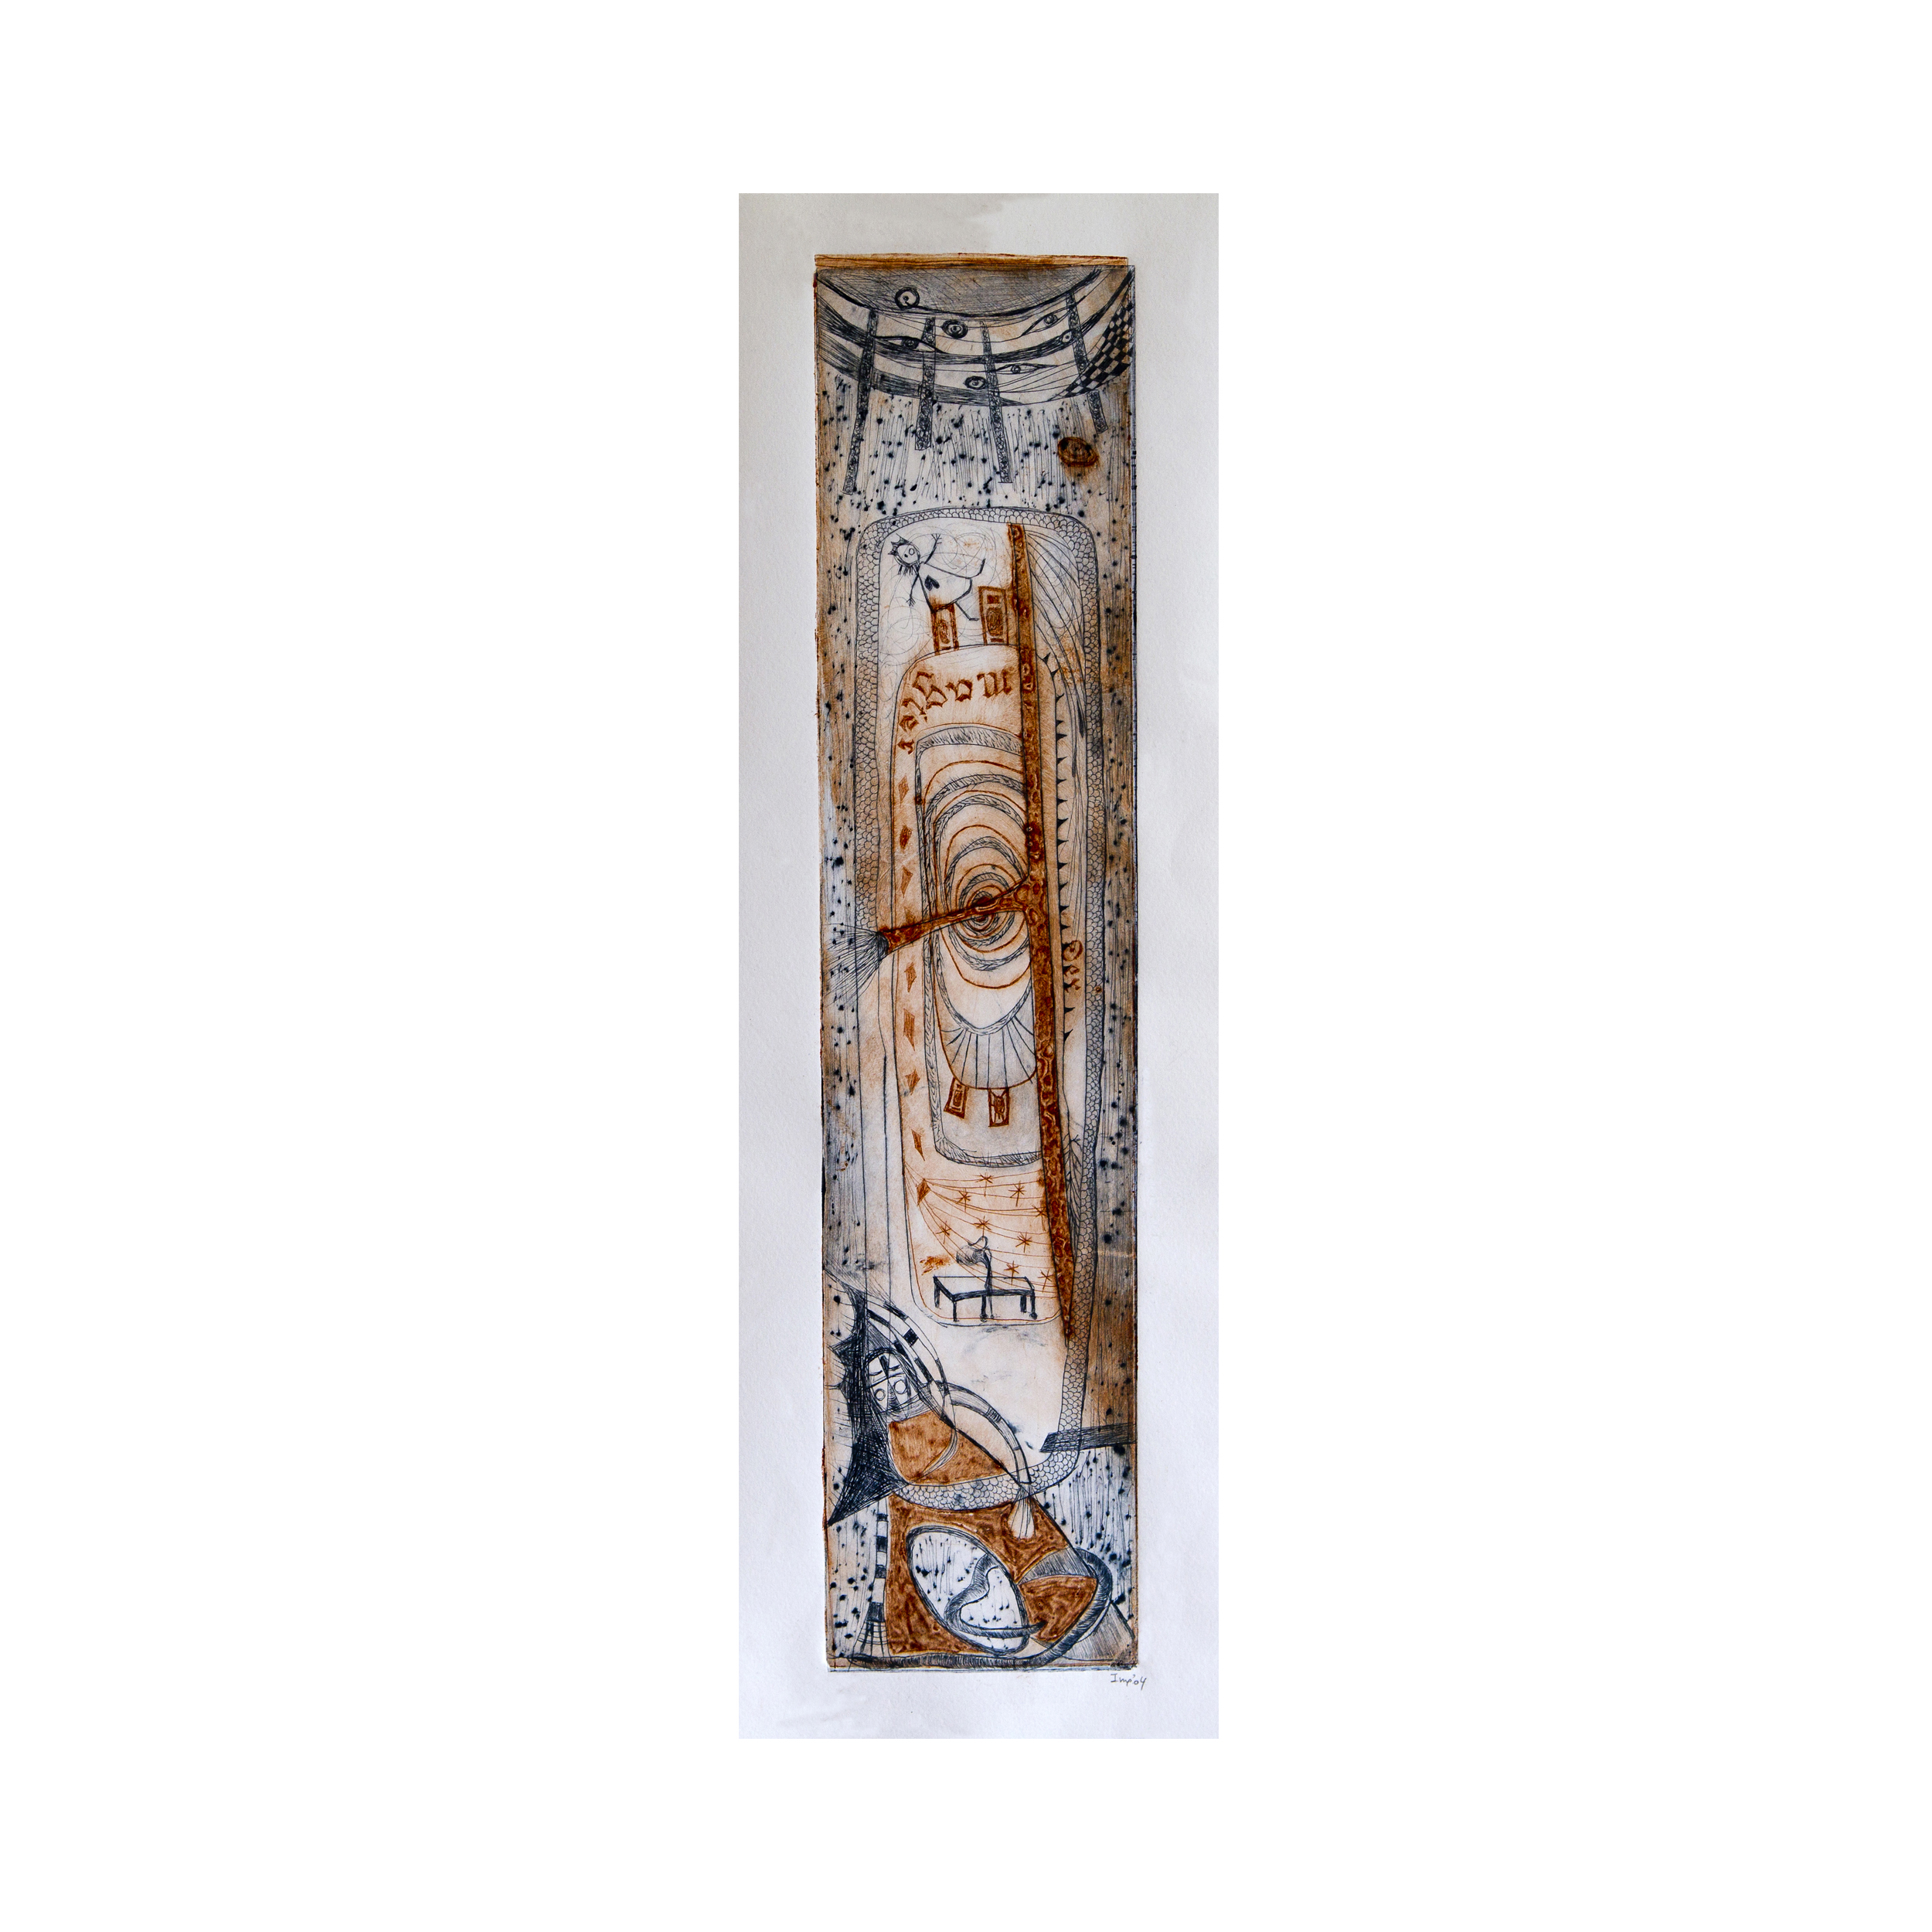 """The Magician"", Limited edition print, mixed media on plexiglas 10 x 45 cm 2004"